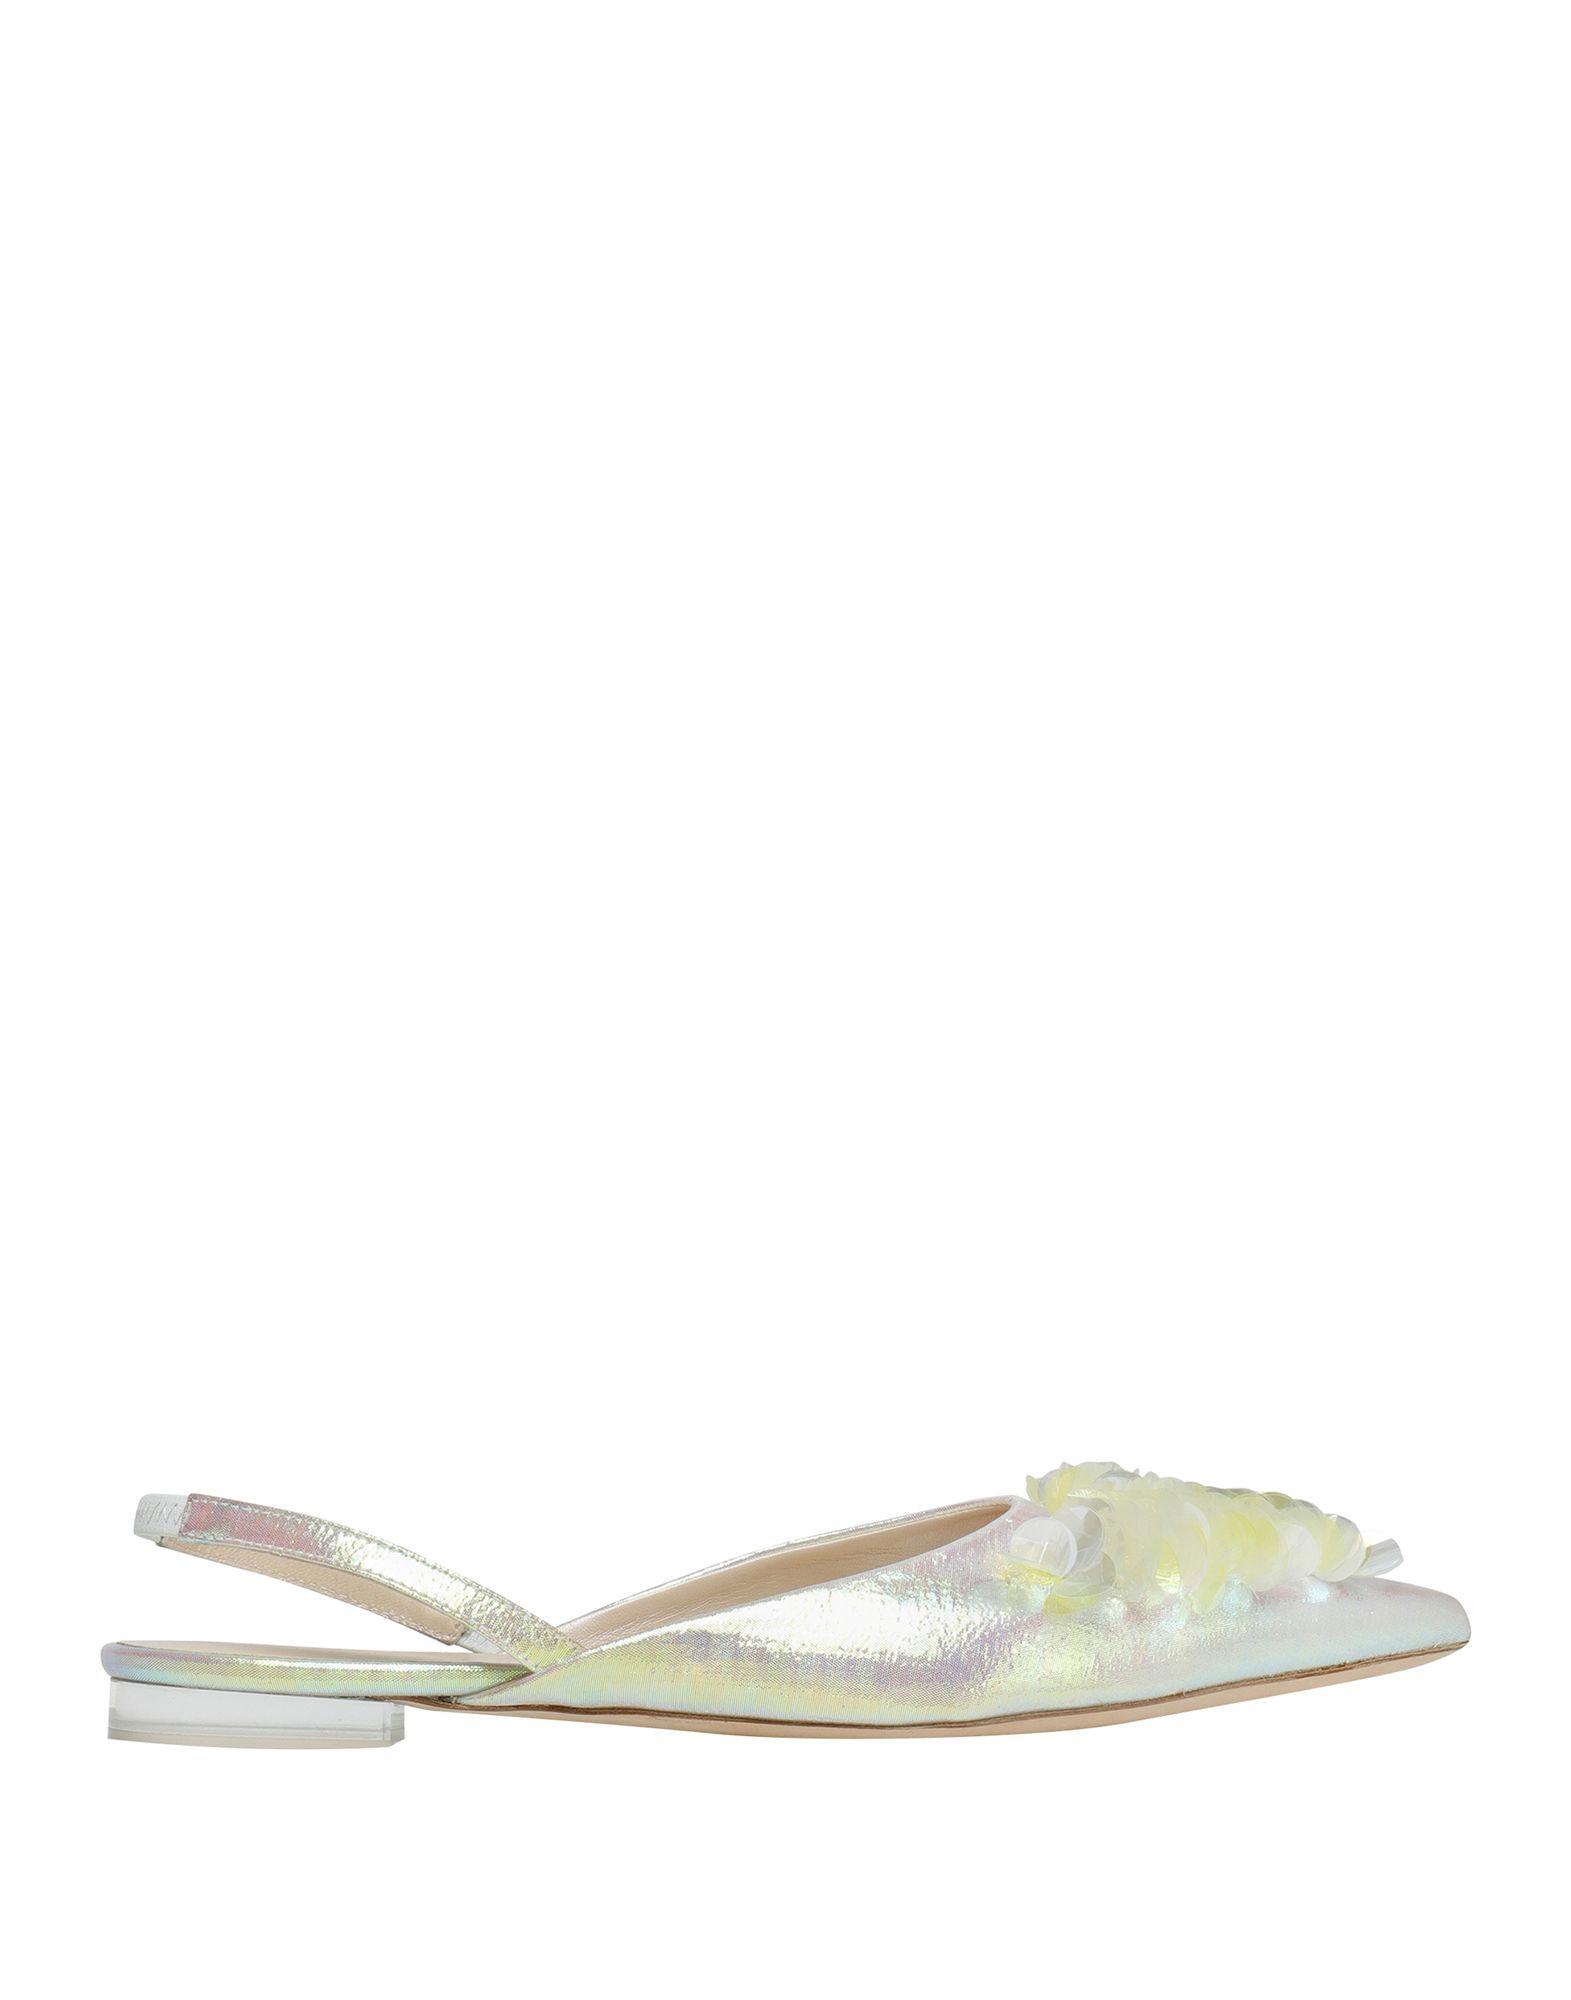 DELPOZO | DELPOZO Ballet Flats 11697663 | Goxip